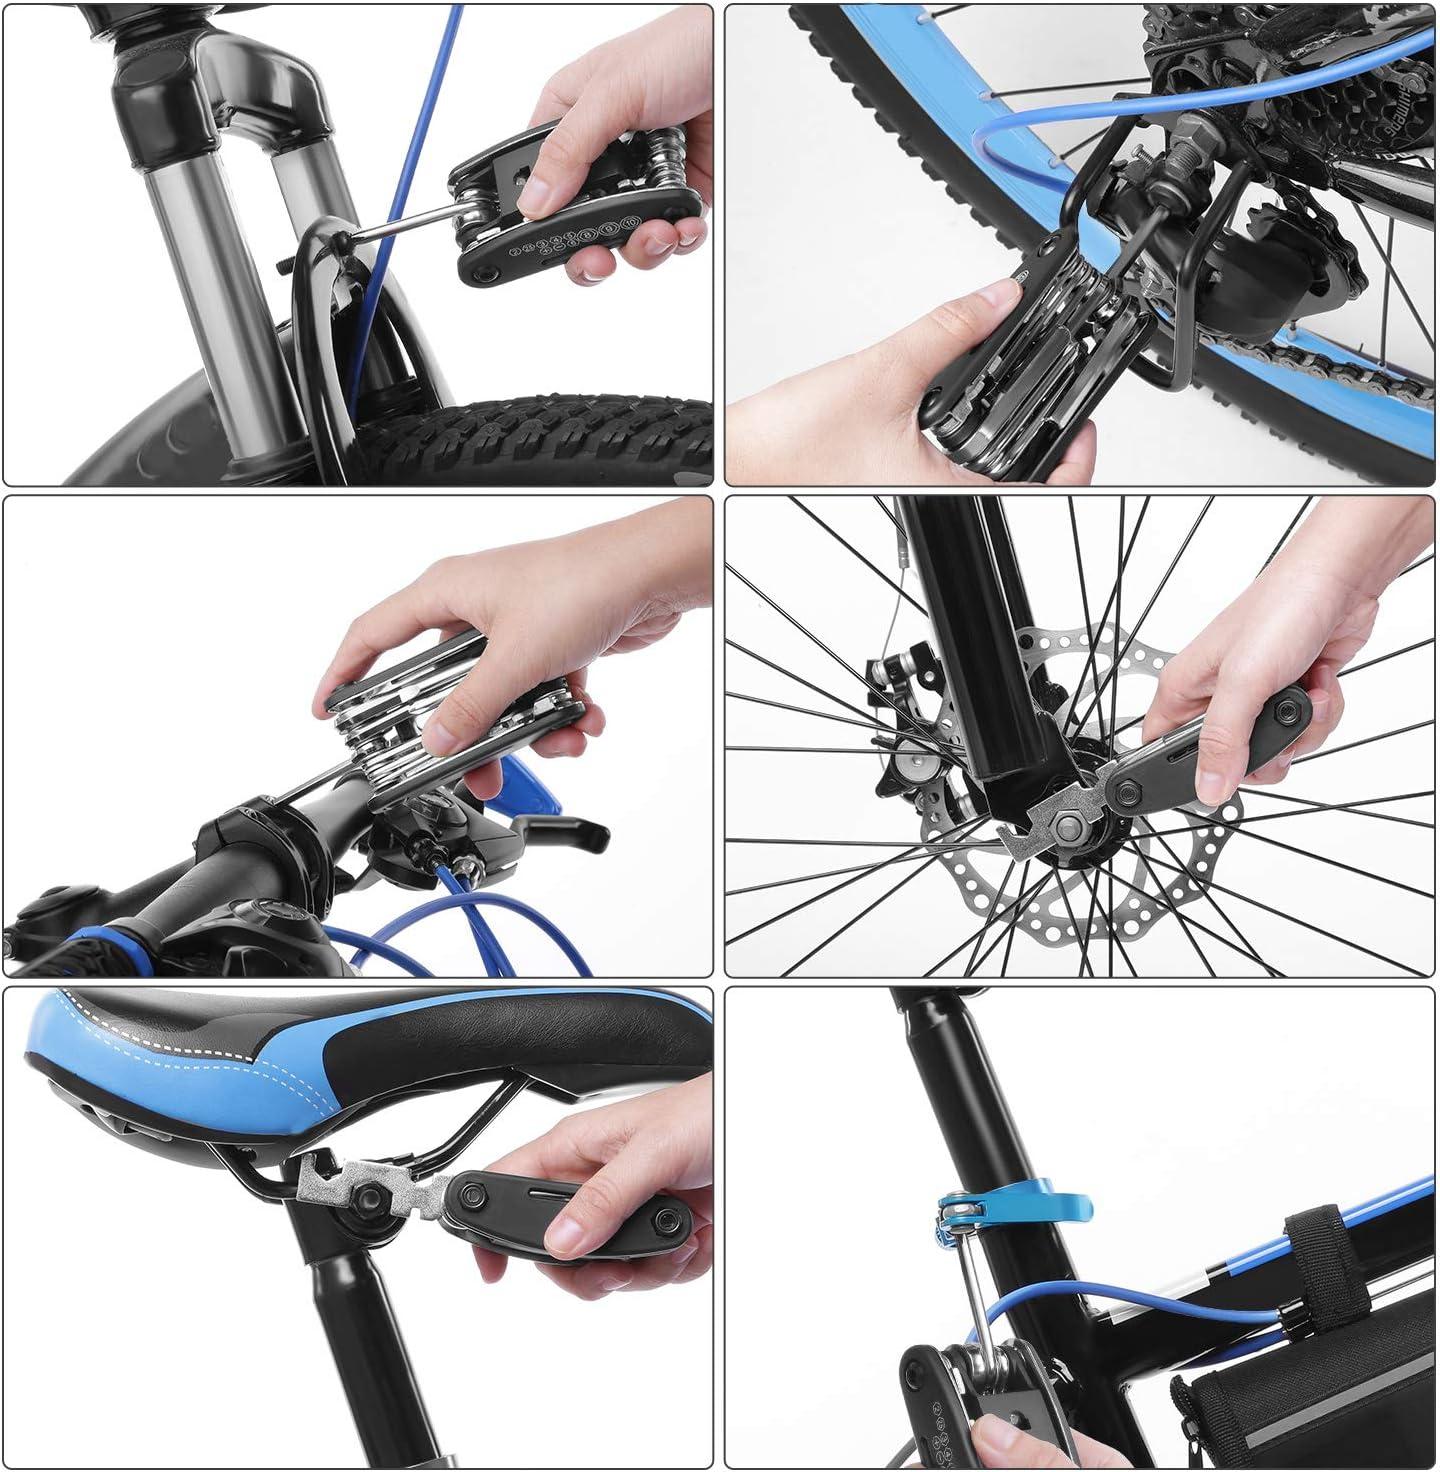 SKM Kit de Reparación de Bicicletas con Bolsa de Transporte, 16 en ...